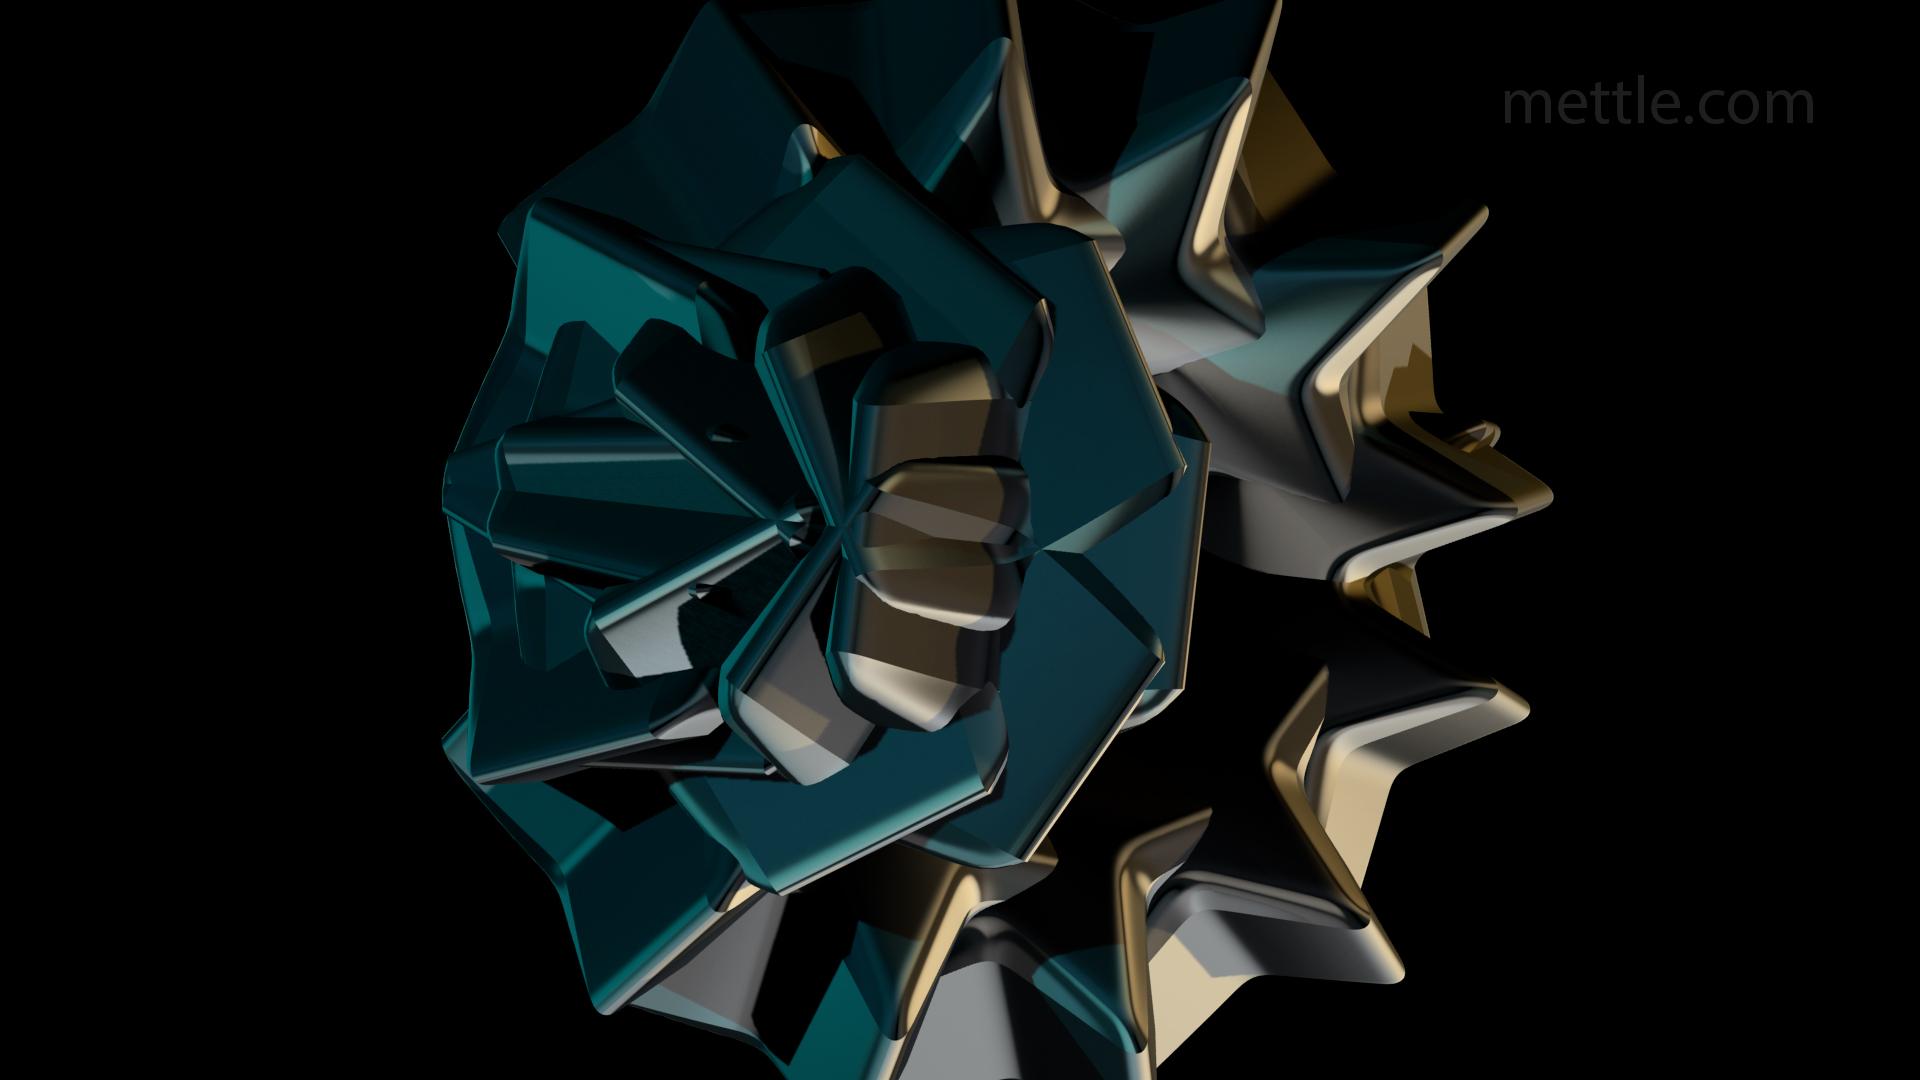 mettle-shapeshifter-7